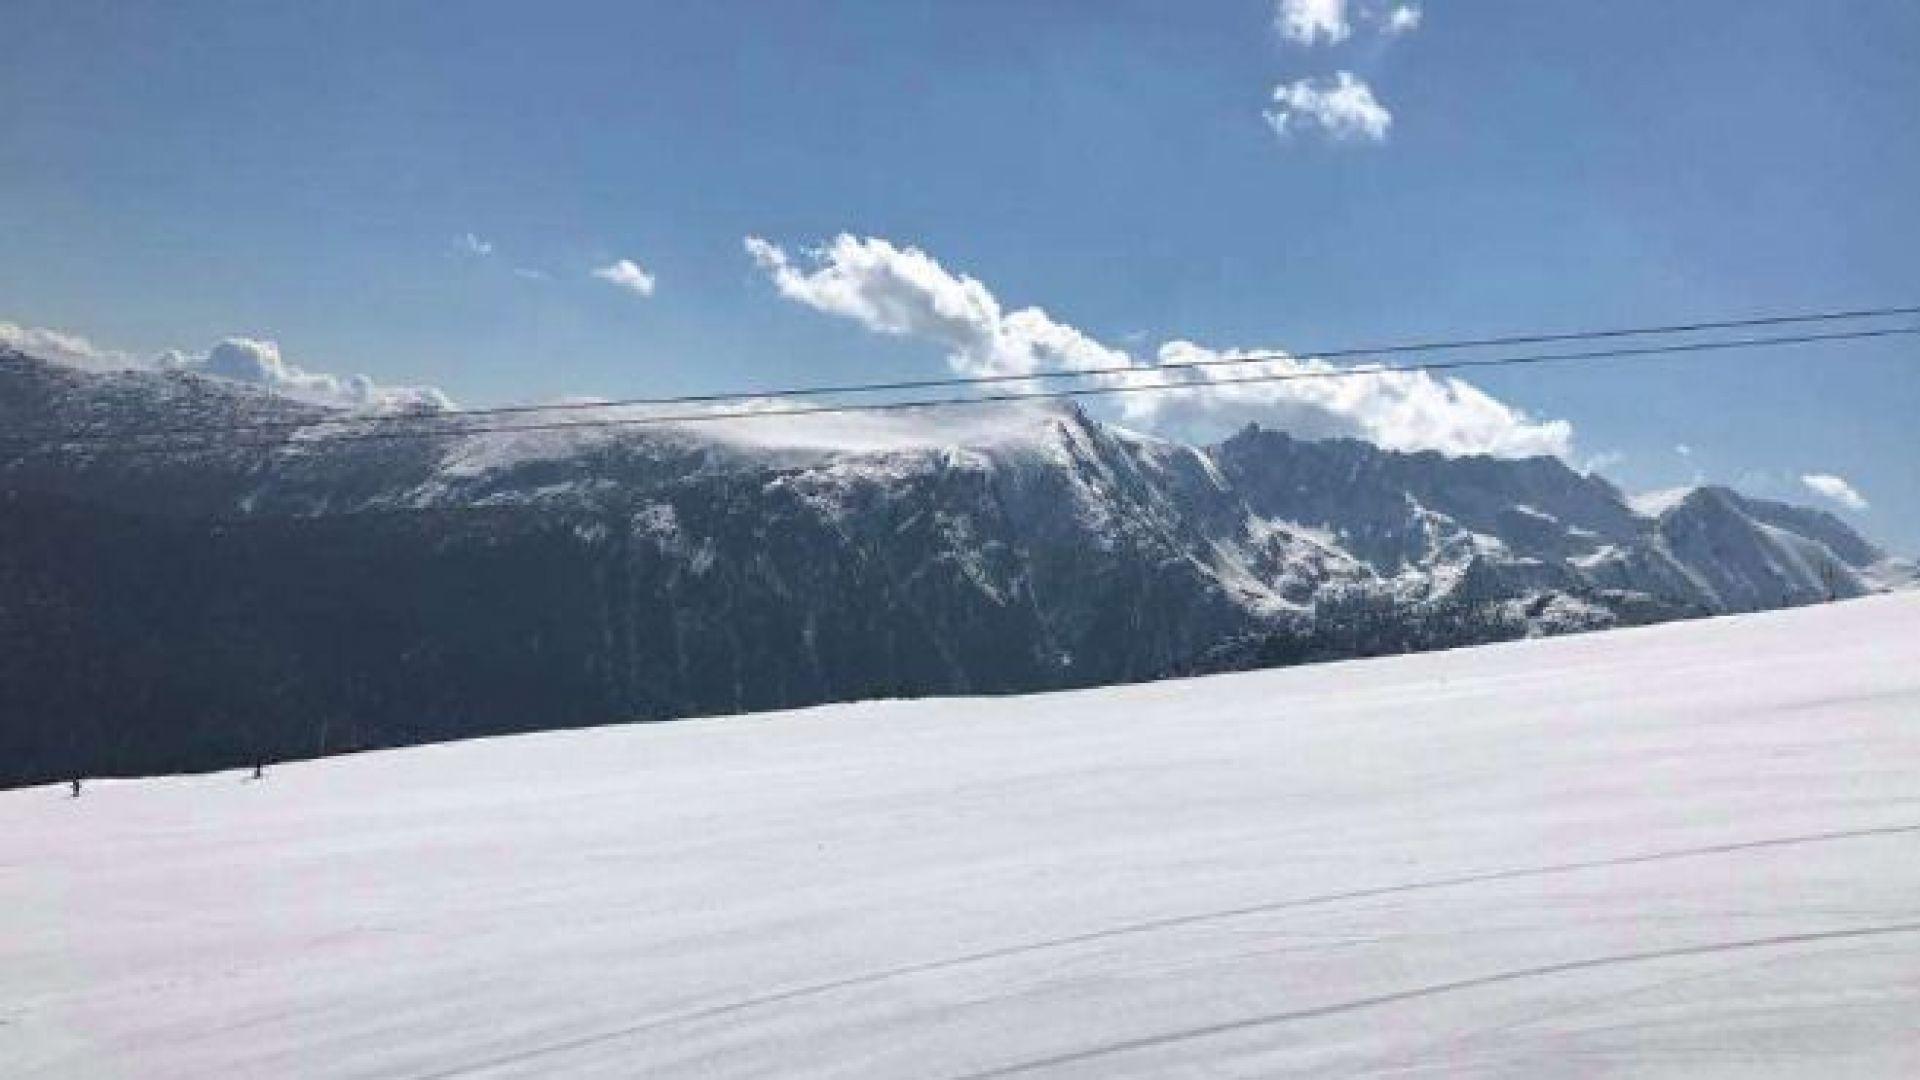 Спасиха петима македонски сноубордисти, попаднали в улей в Пирин